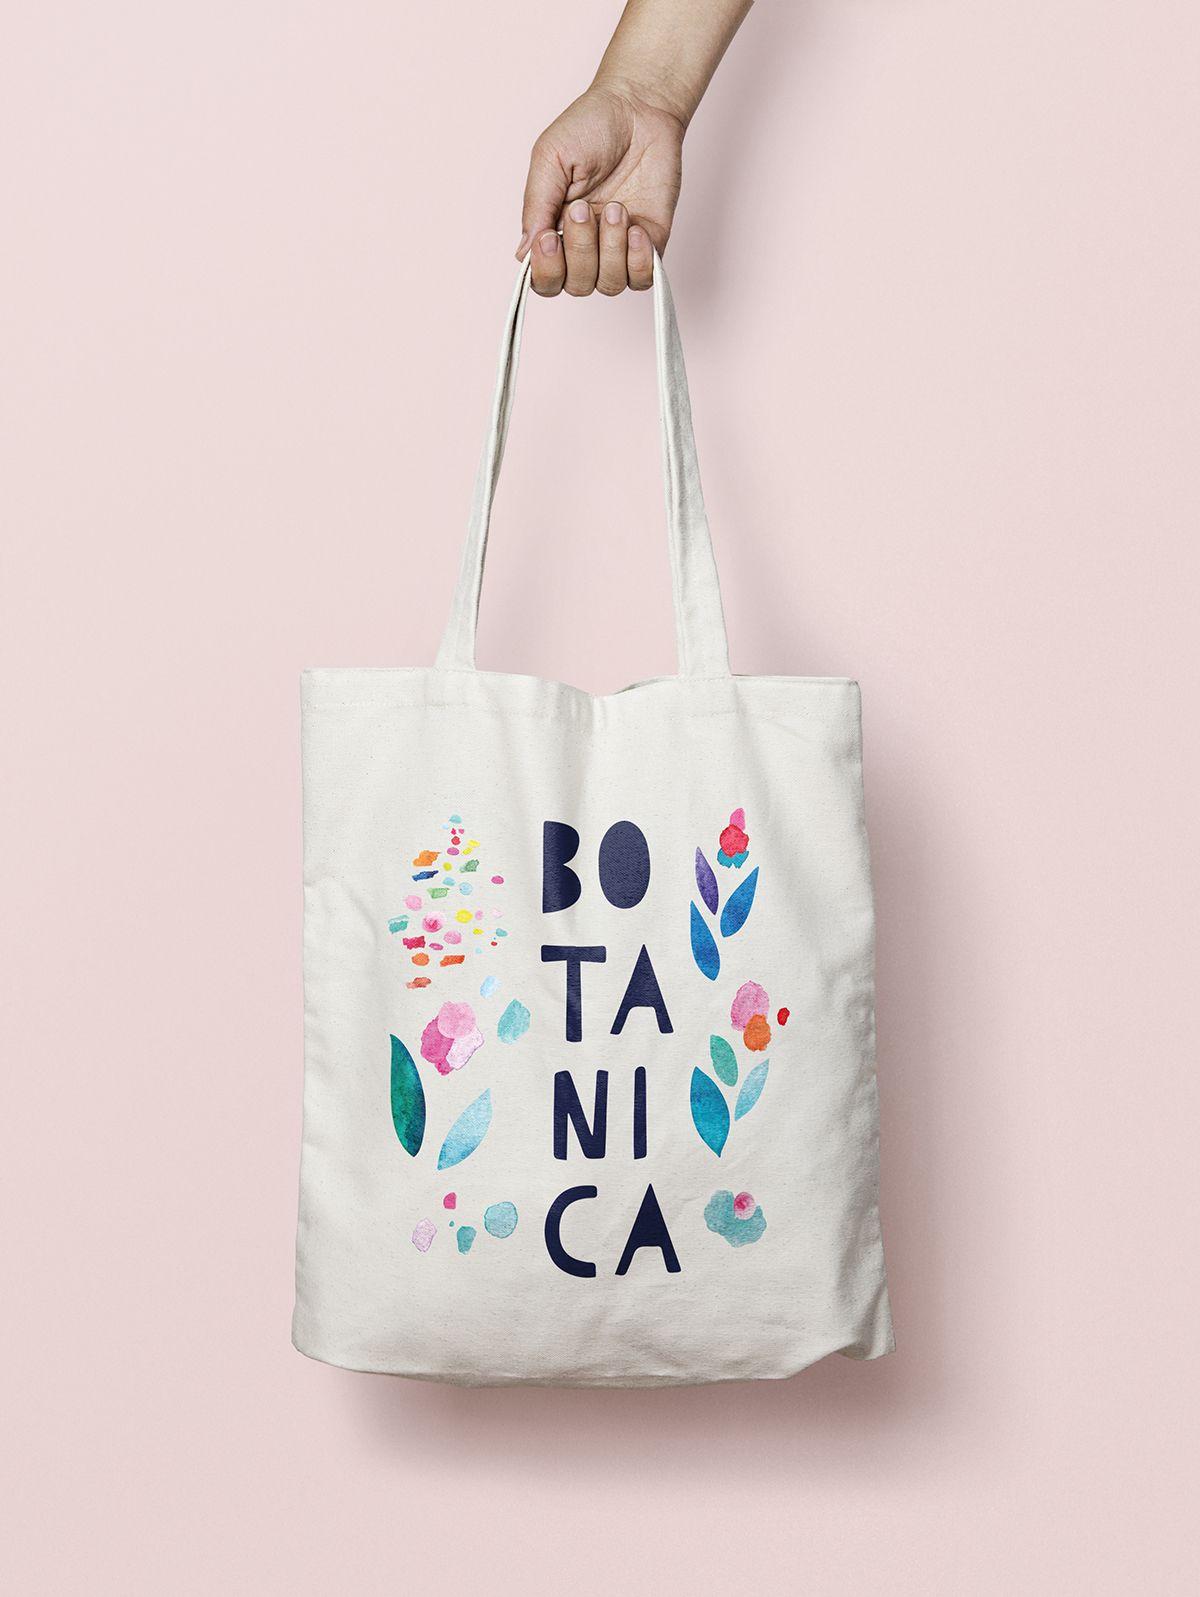 Botanica festival 活動視覺設計 | MyDesy 淘靈感